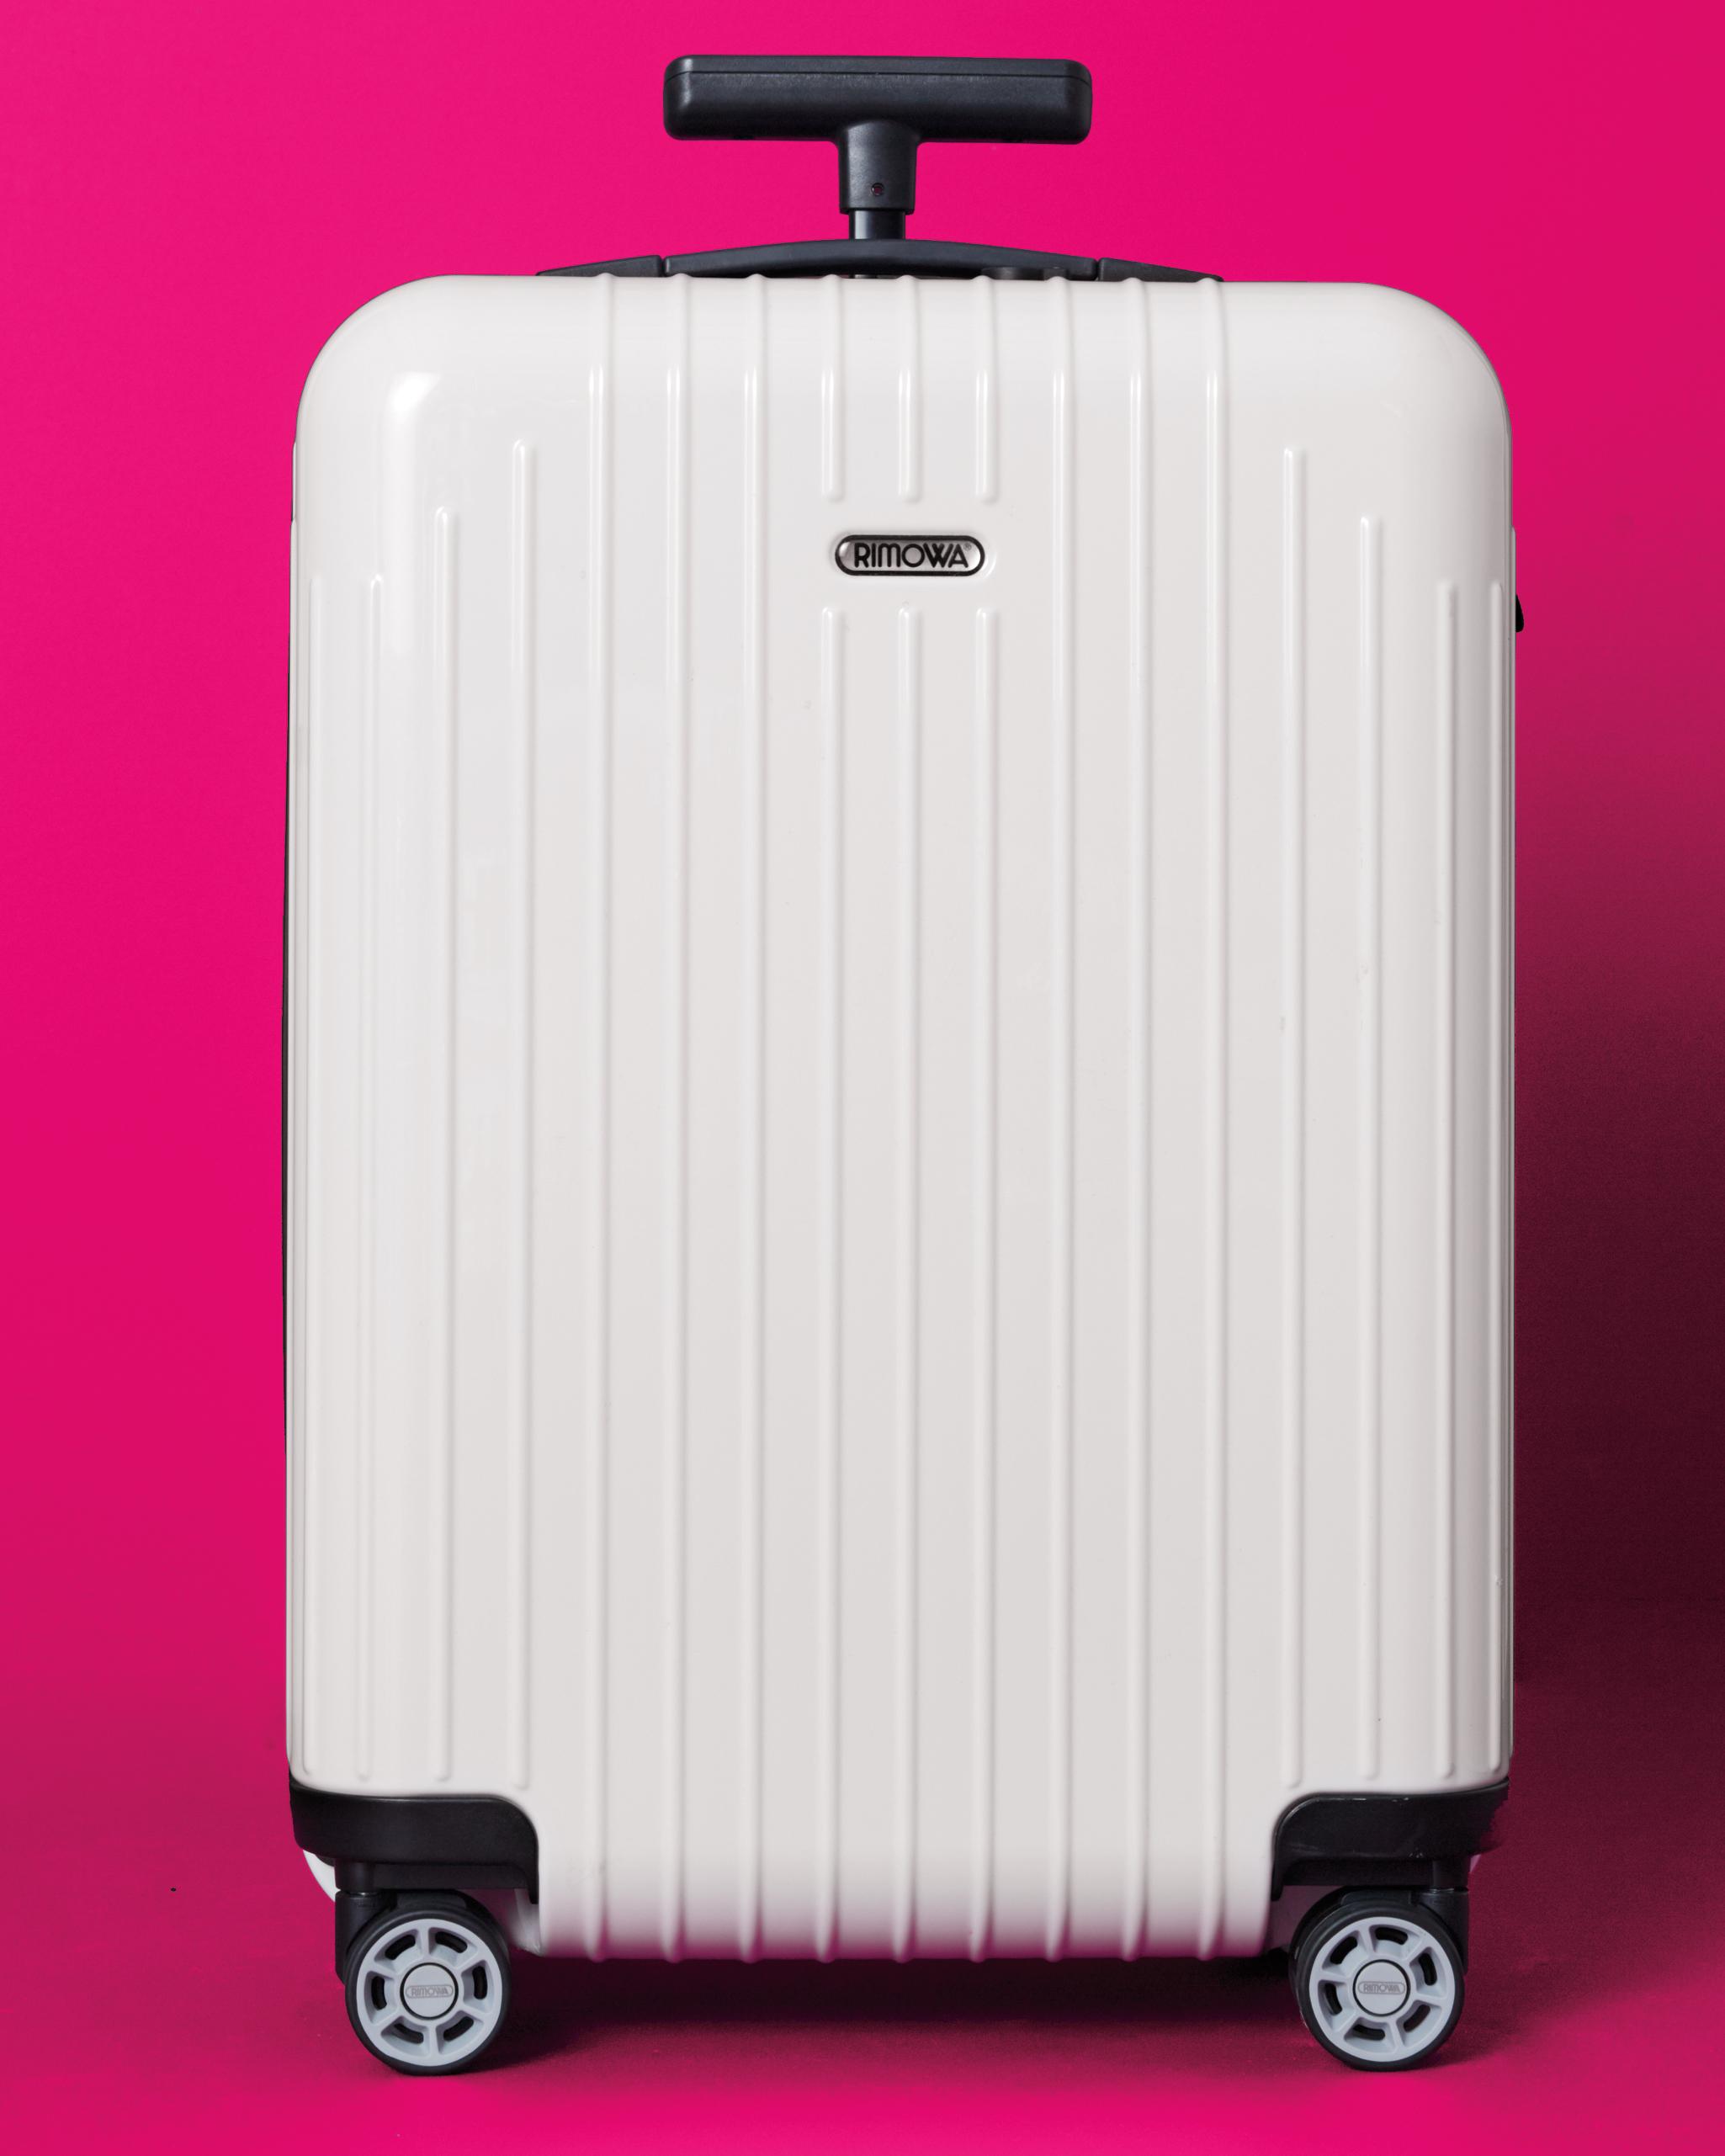 rimowa-luggage-228-d112473.jpg